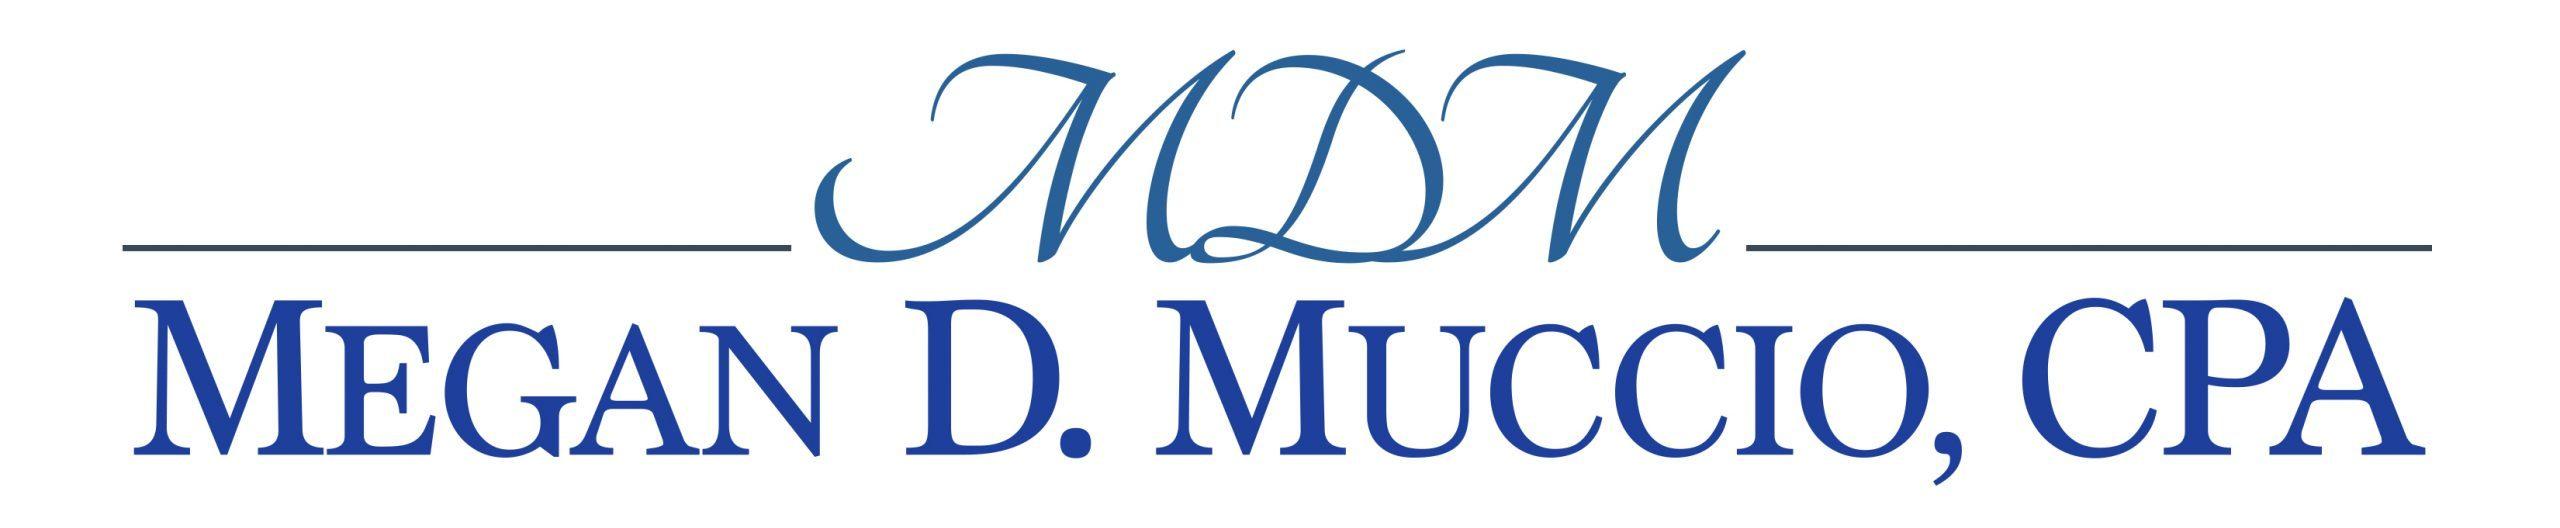 Megan D. Muccio logo - MDM on top with a black line with Megan D. Muccio, CPA written underneath